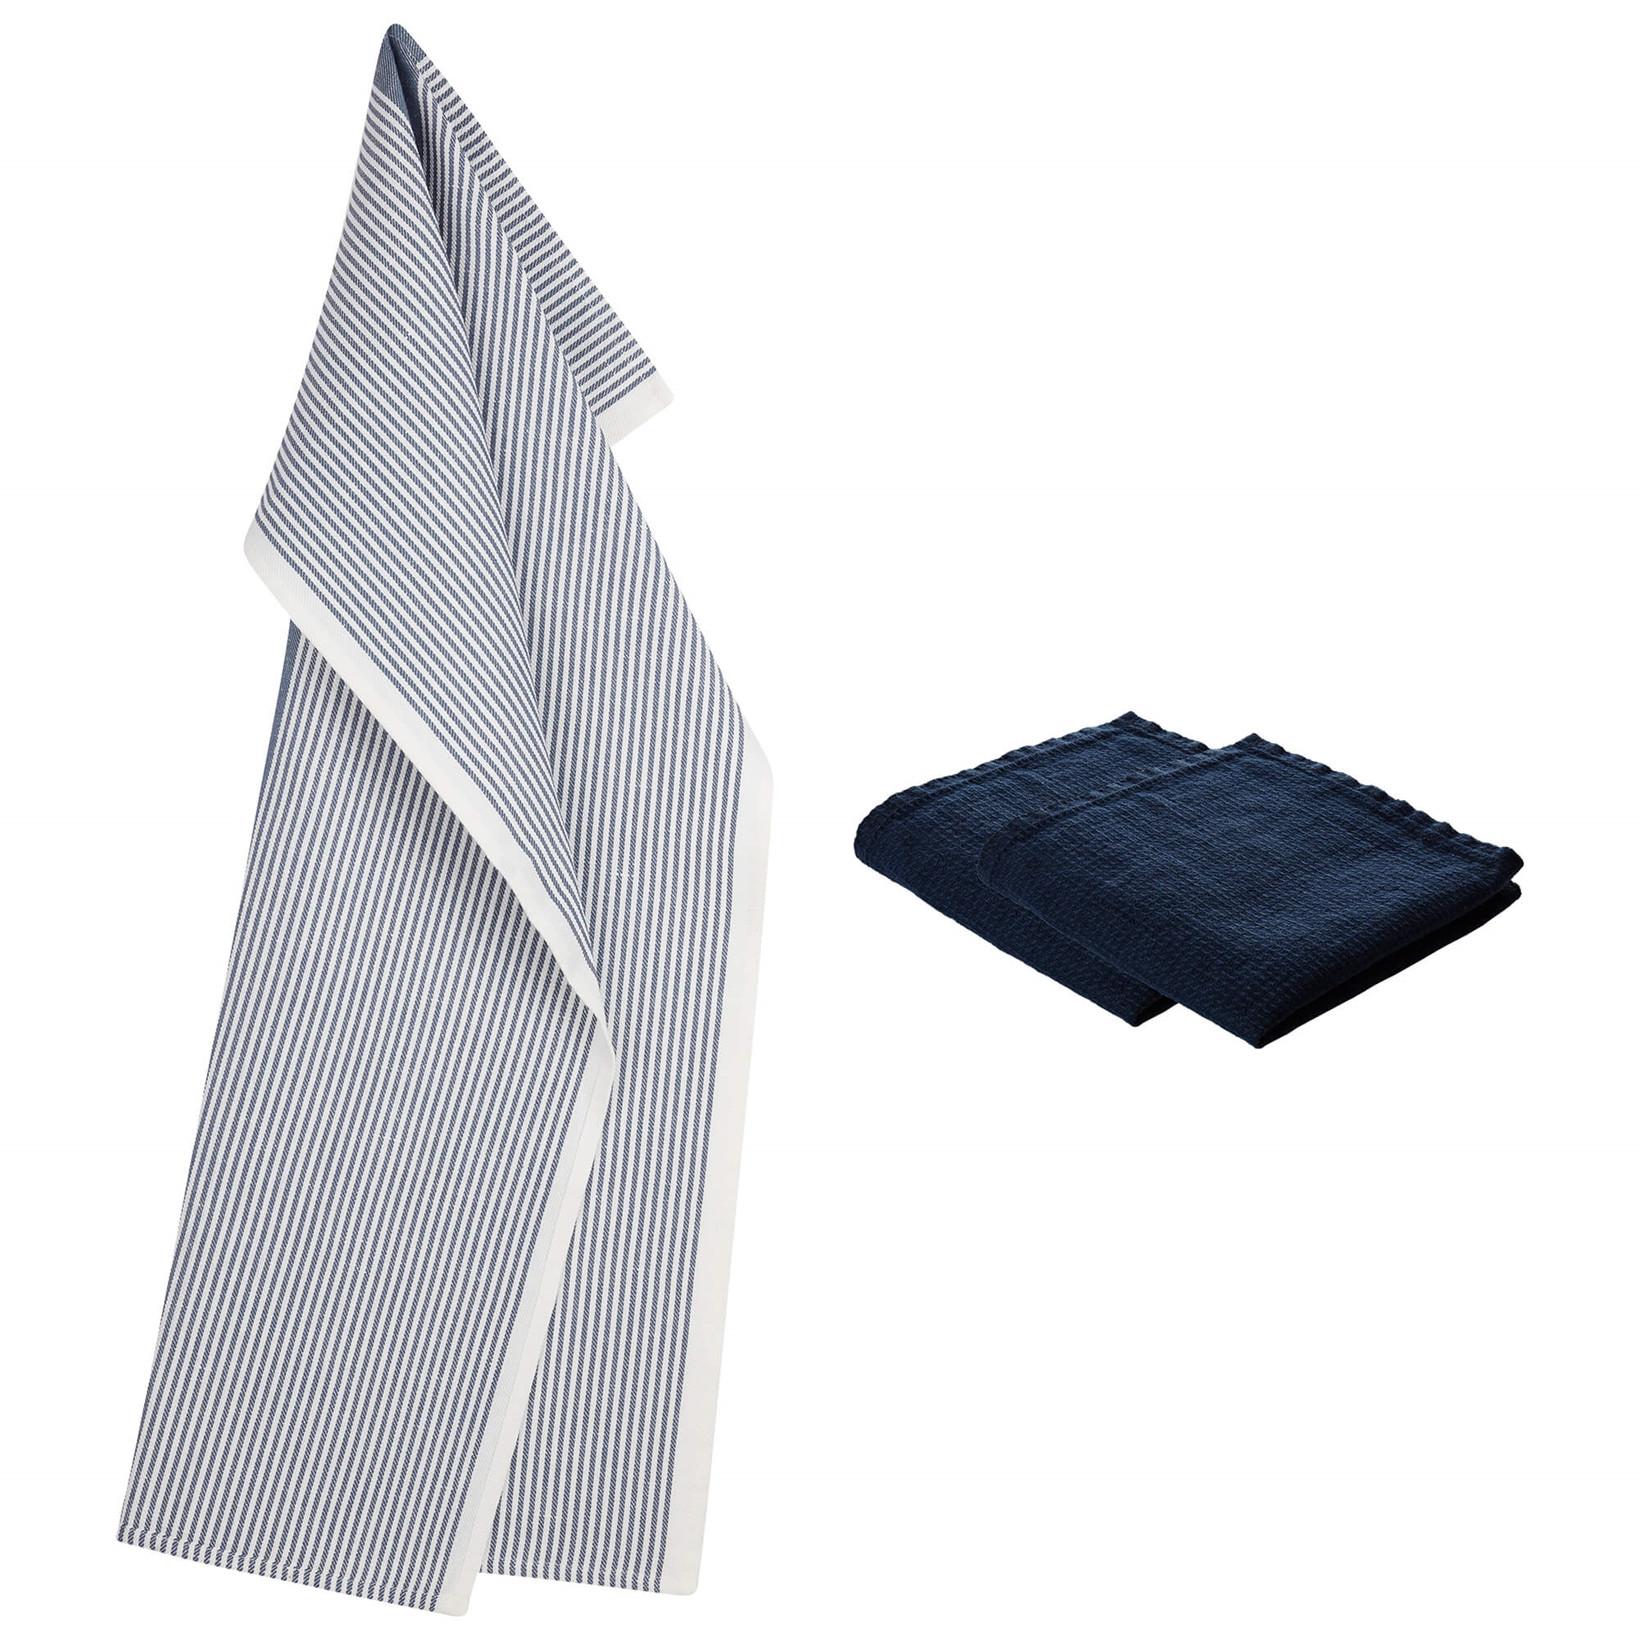 1 TWILL tea towel and 2 LINEN dishcloths